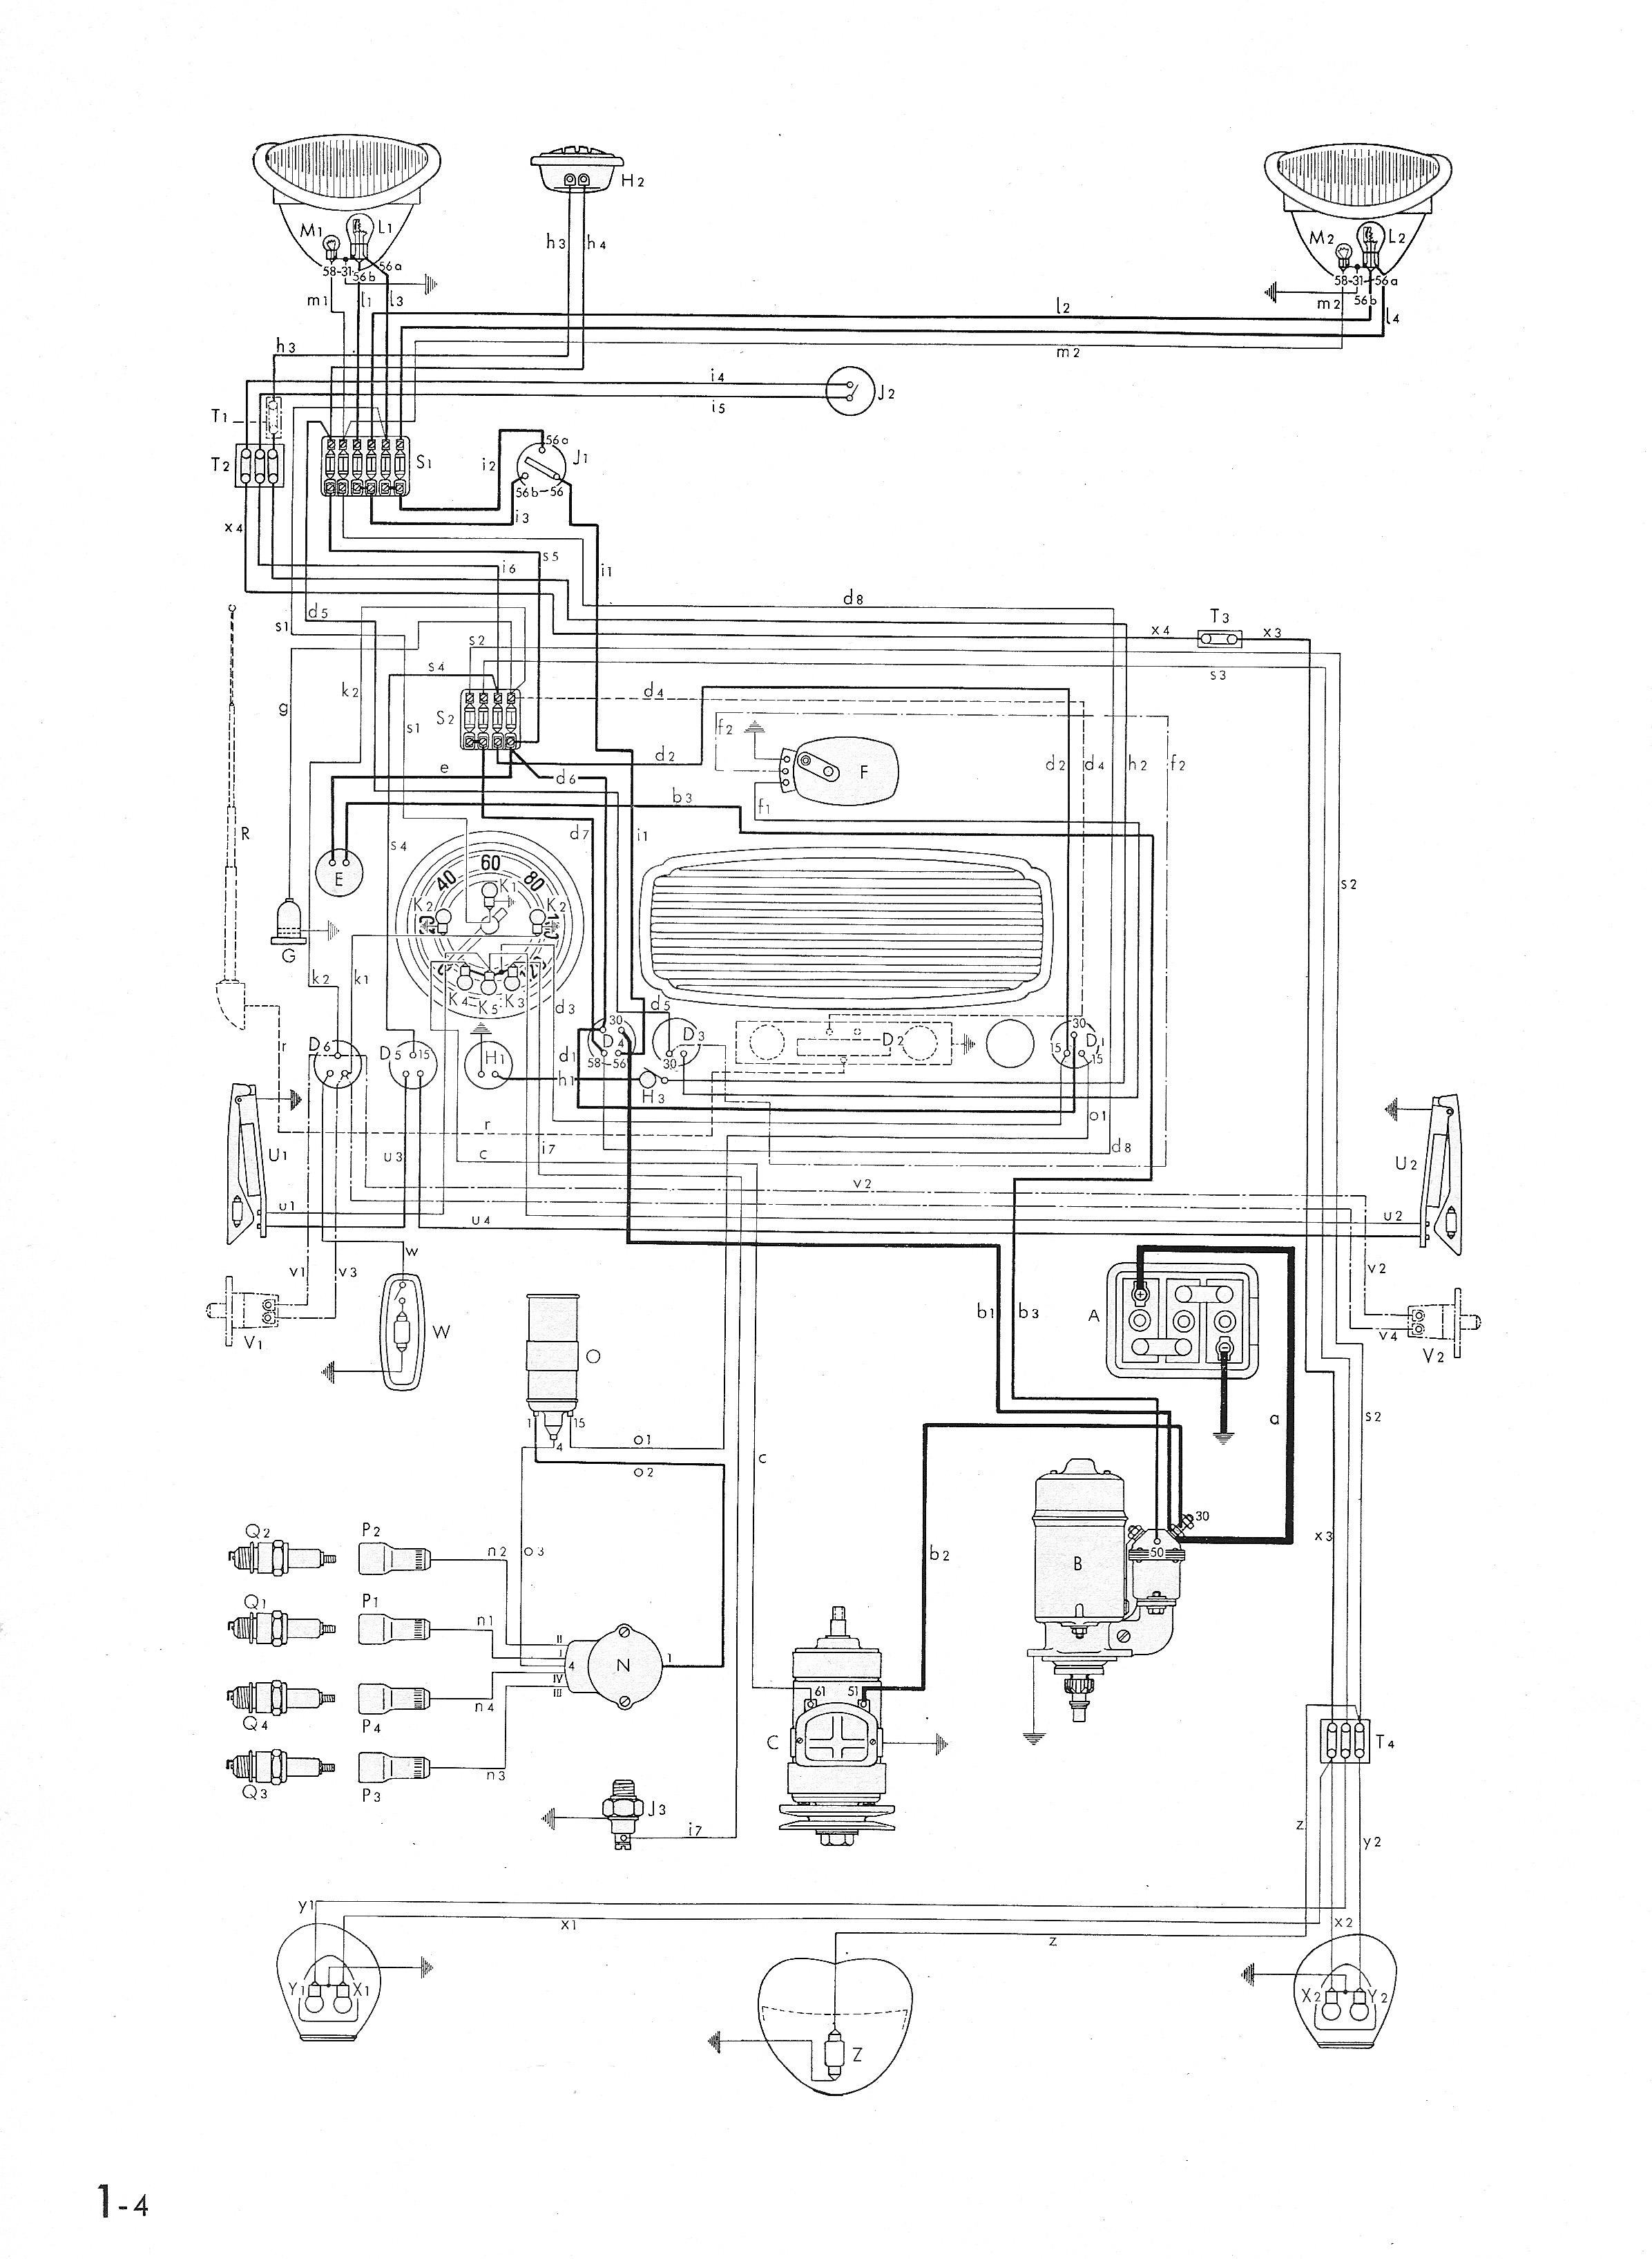 1969 vw bug radio wiring diagrams